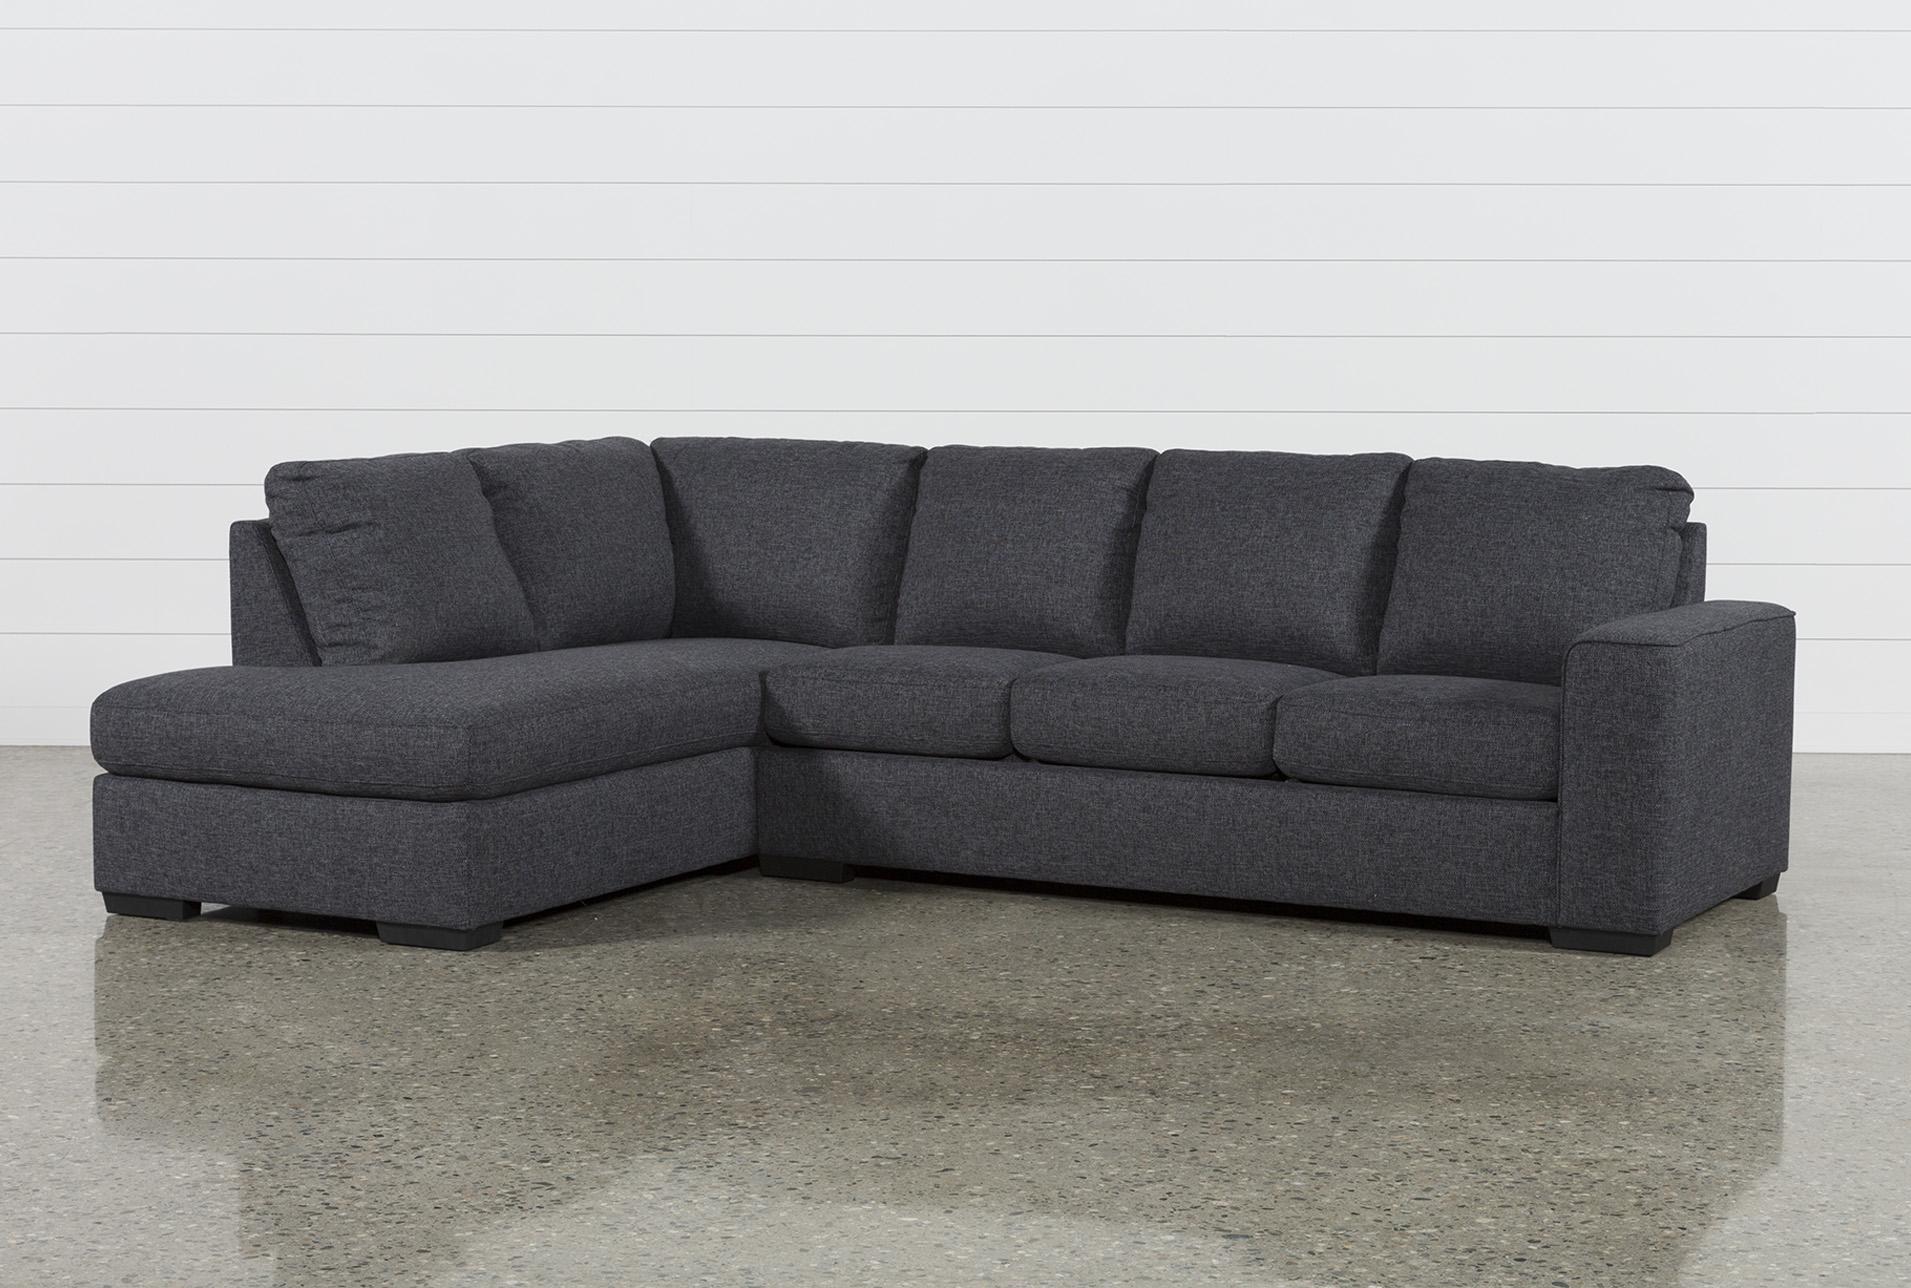 sleeper sectional sofa lucy dark grey 2 piece sleeper sectional w/laf chaise QDUSAYL